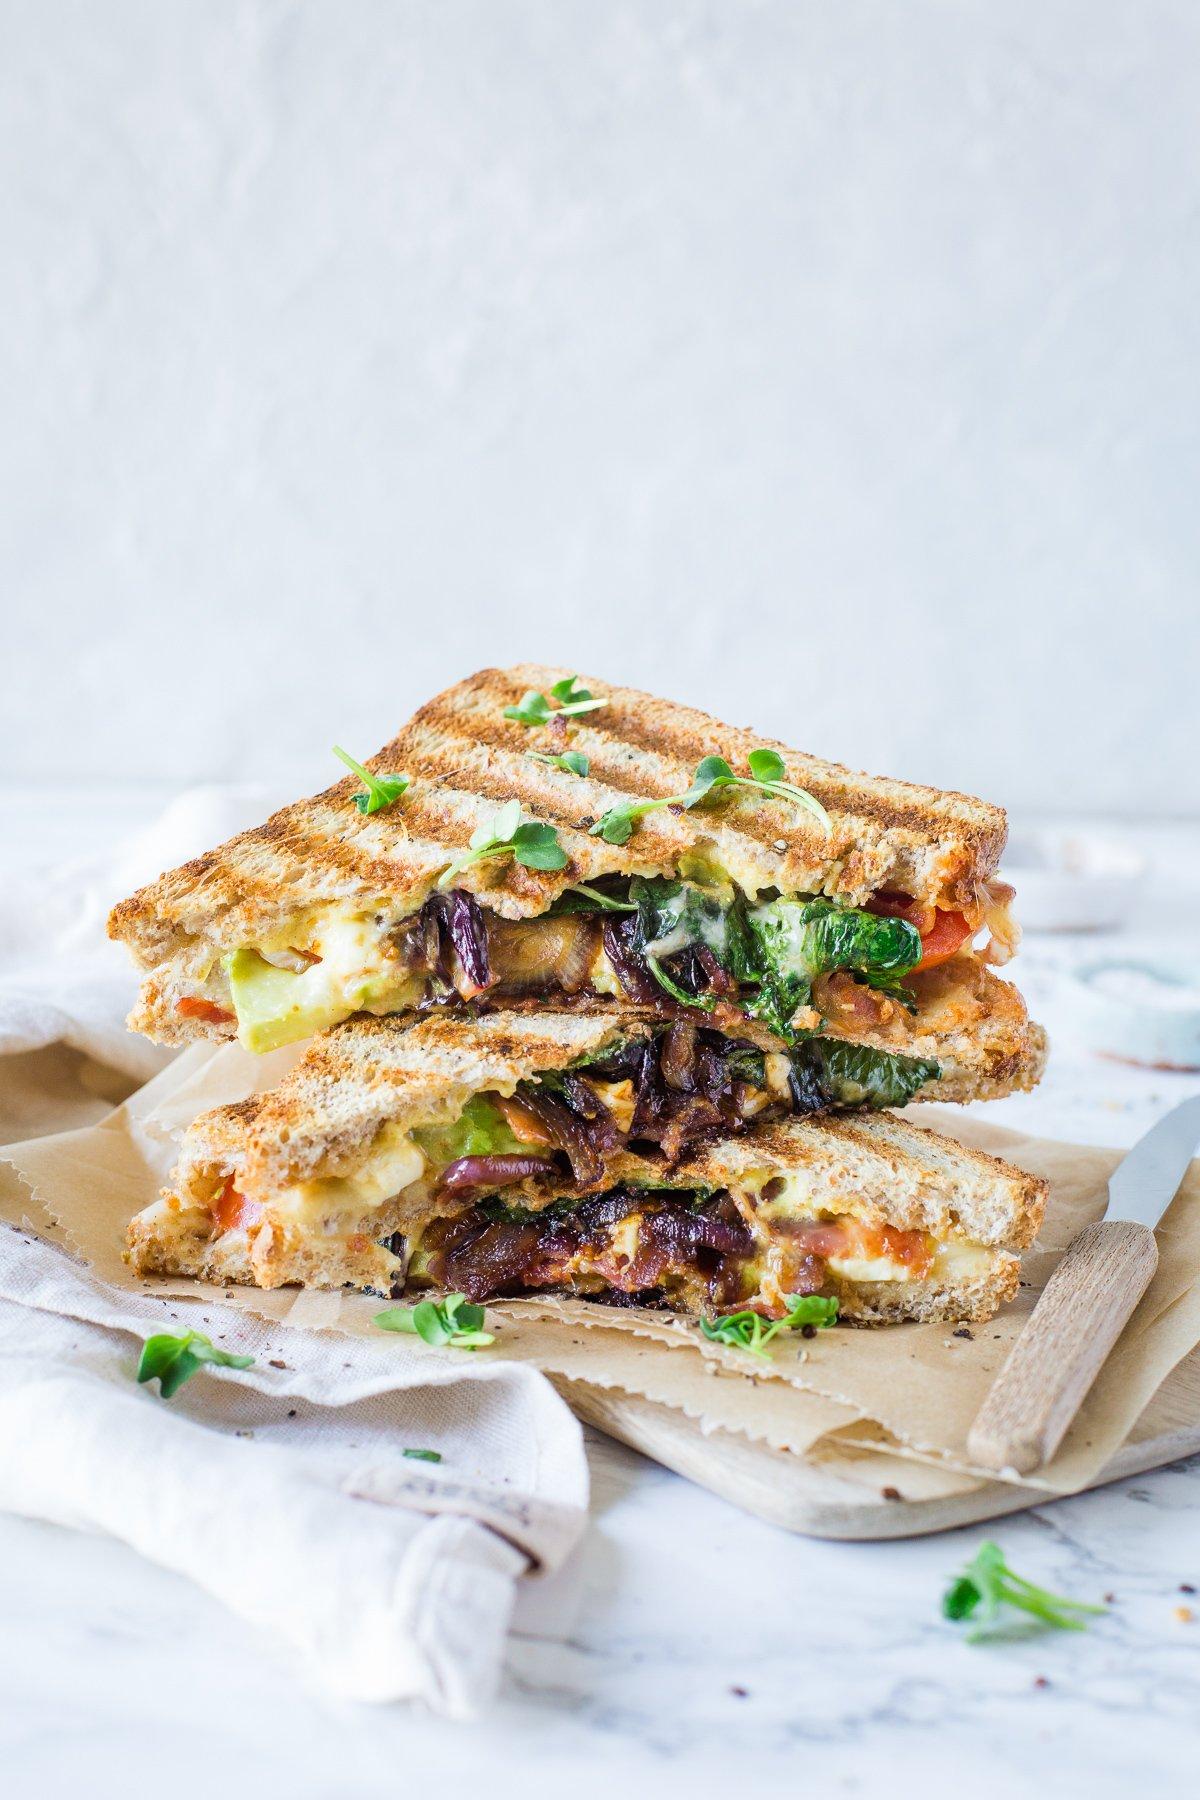 Avocado sandwich mit Bacon